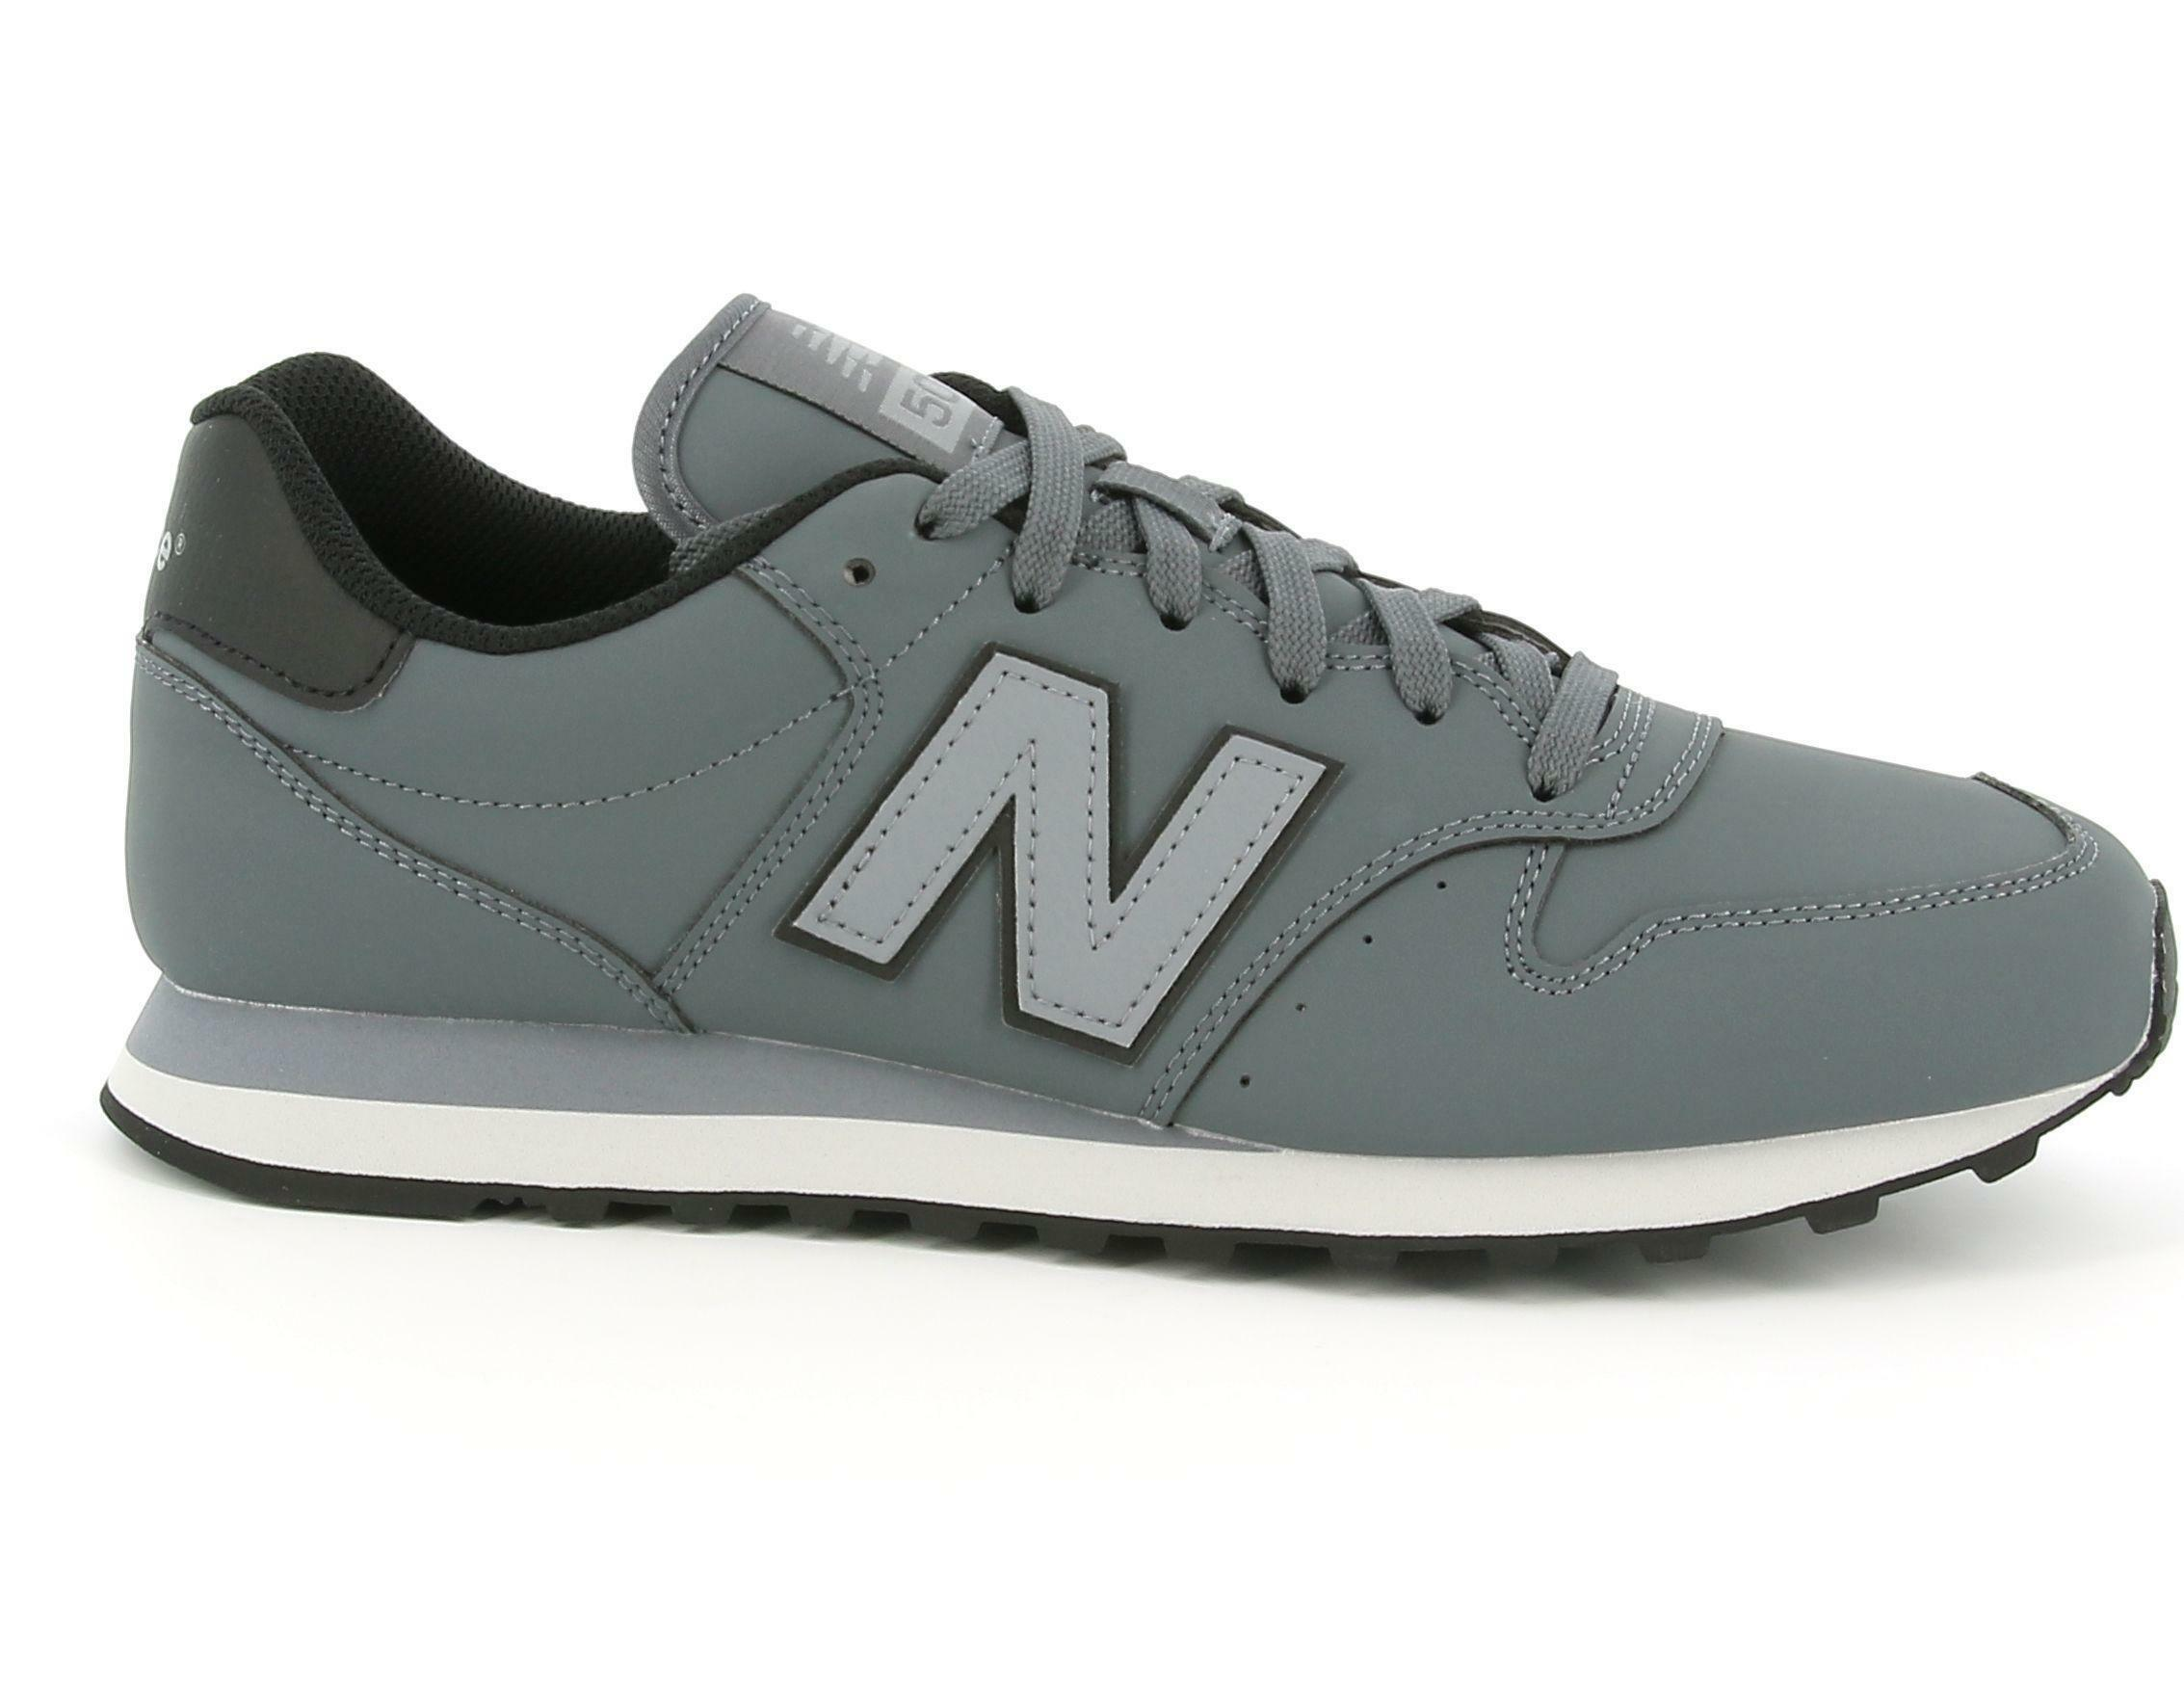 new balance new balance sportivo gm500lb1 grigio scarpe sportive uomo